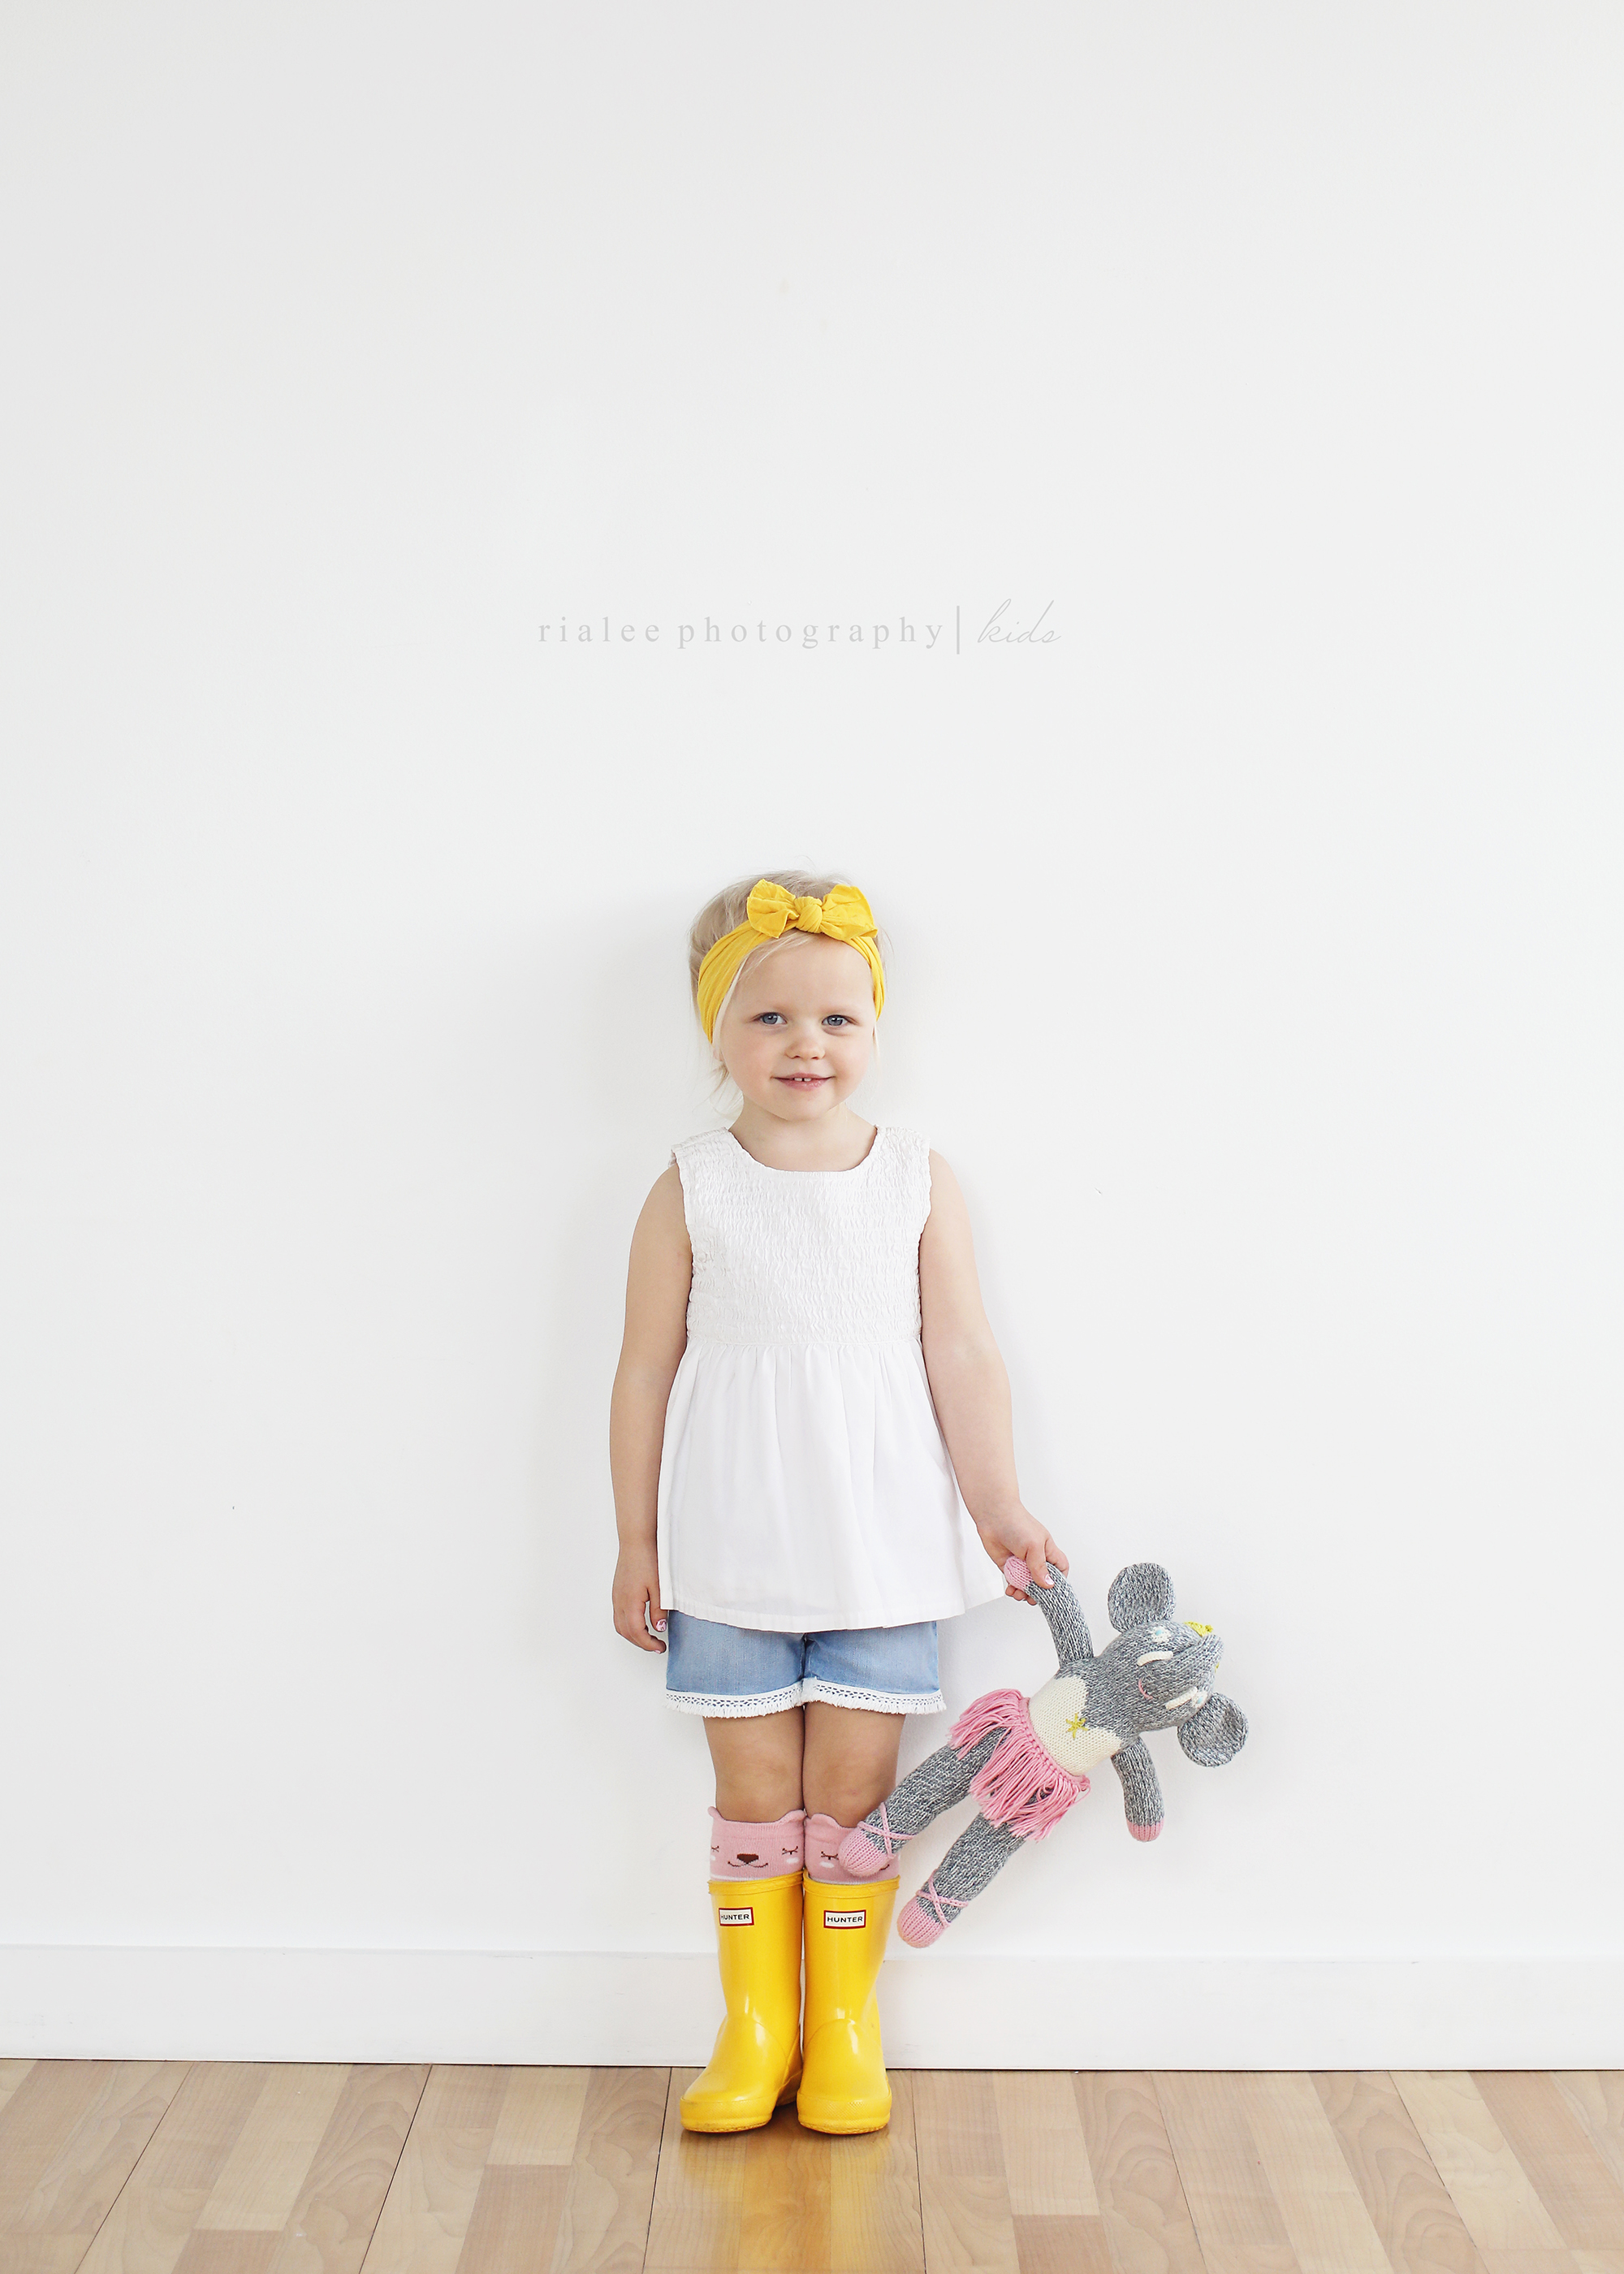 bestfargophotographers.jpg